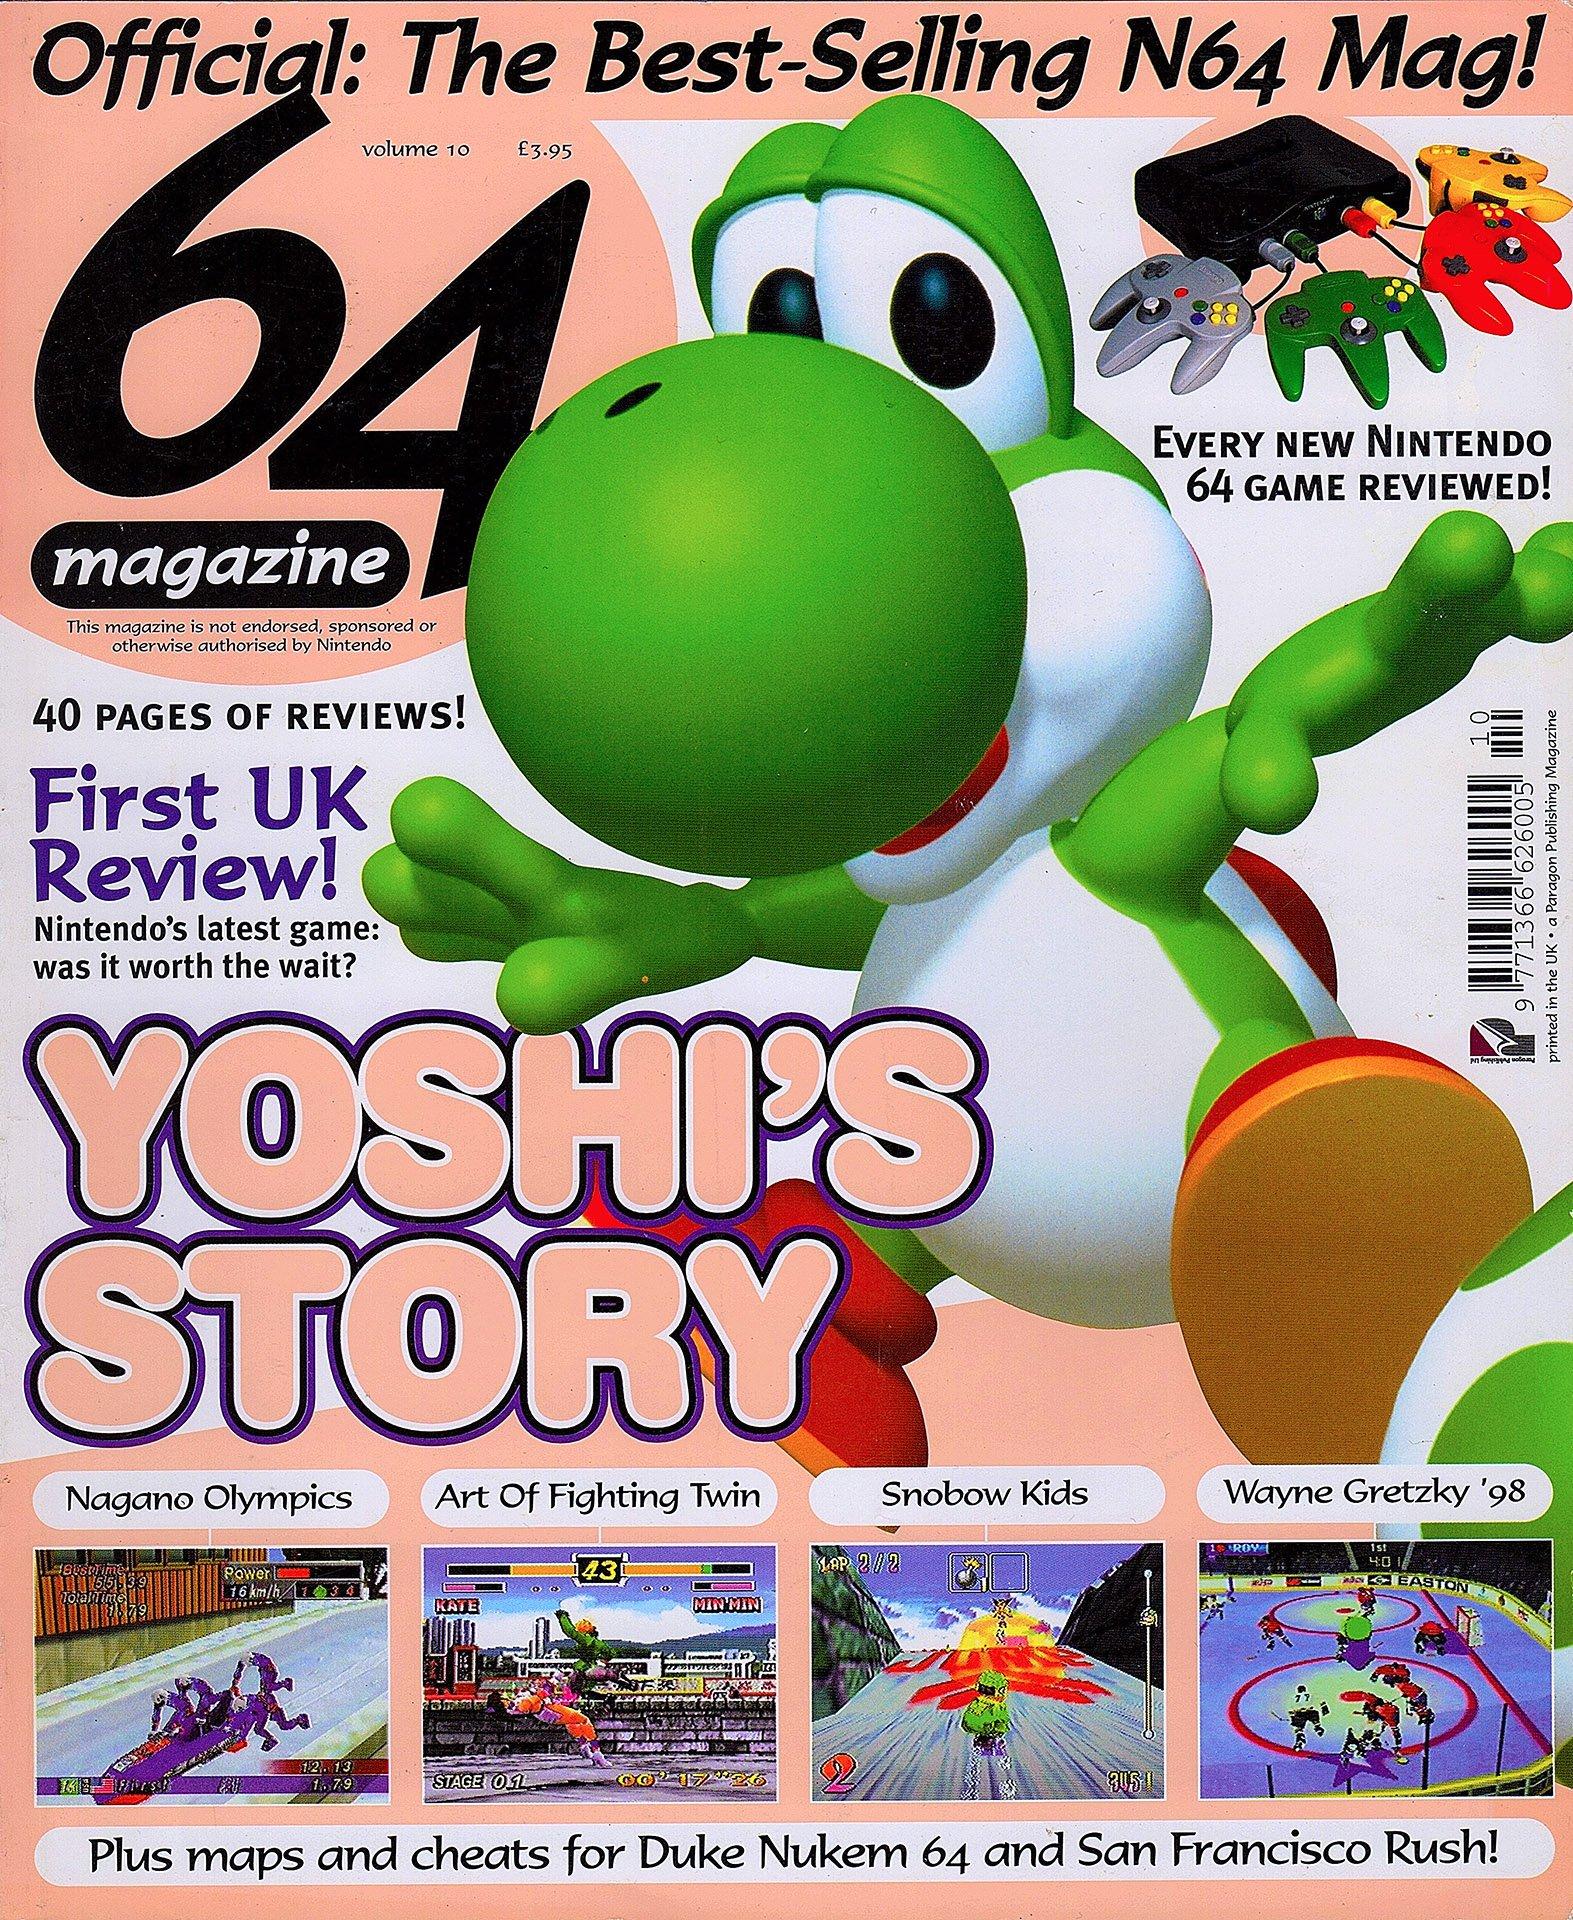 64 Magazine Issue 10 (March 1998)